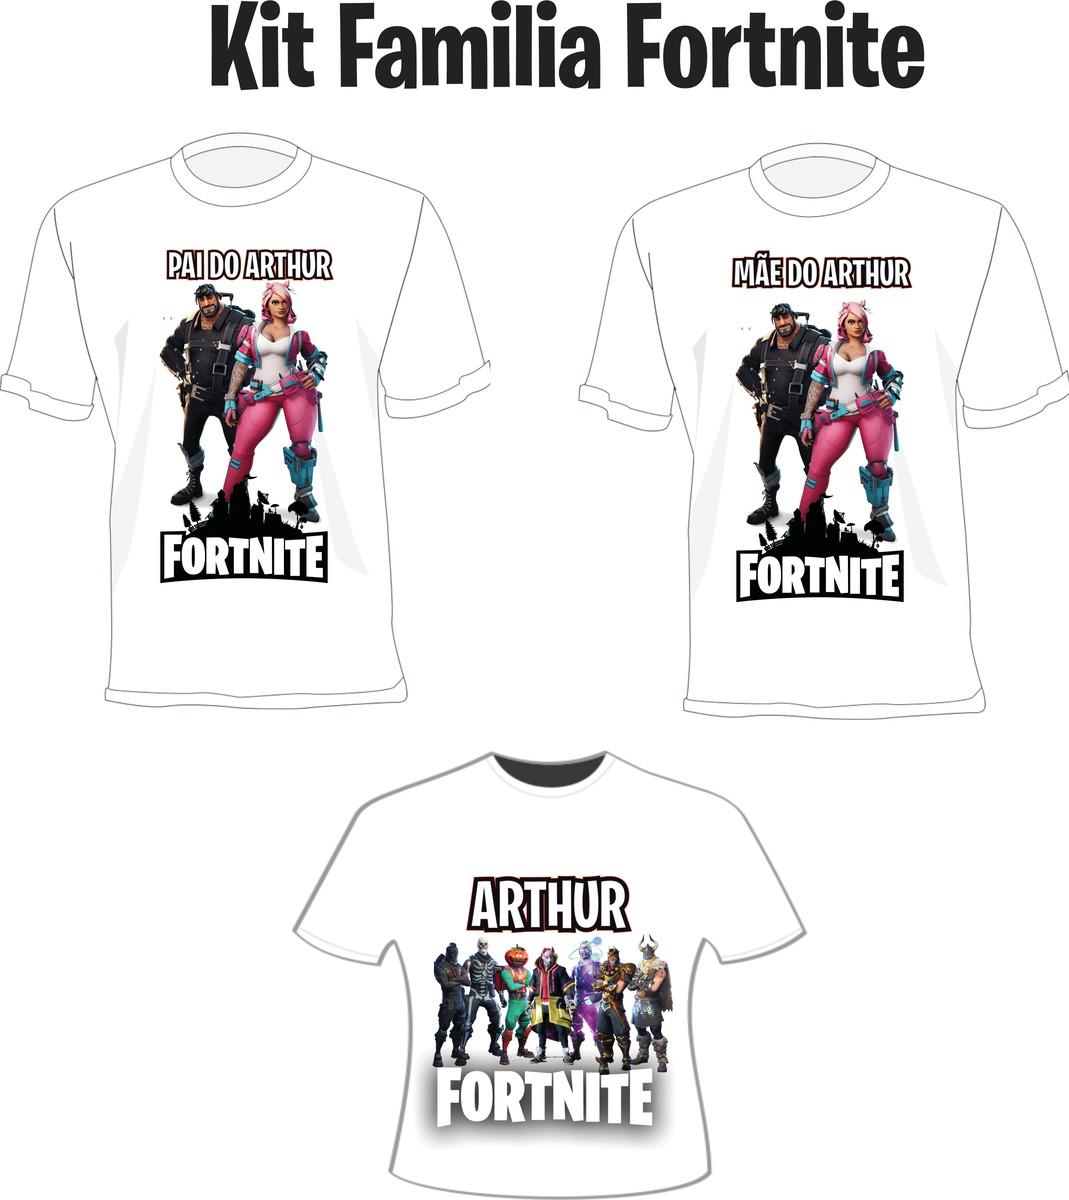 Camiseta Fortnite Festa Kit  03 camisetas - Personalizada no Elo7 ... 4328f7a57758d